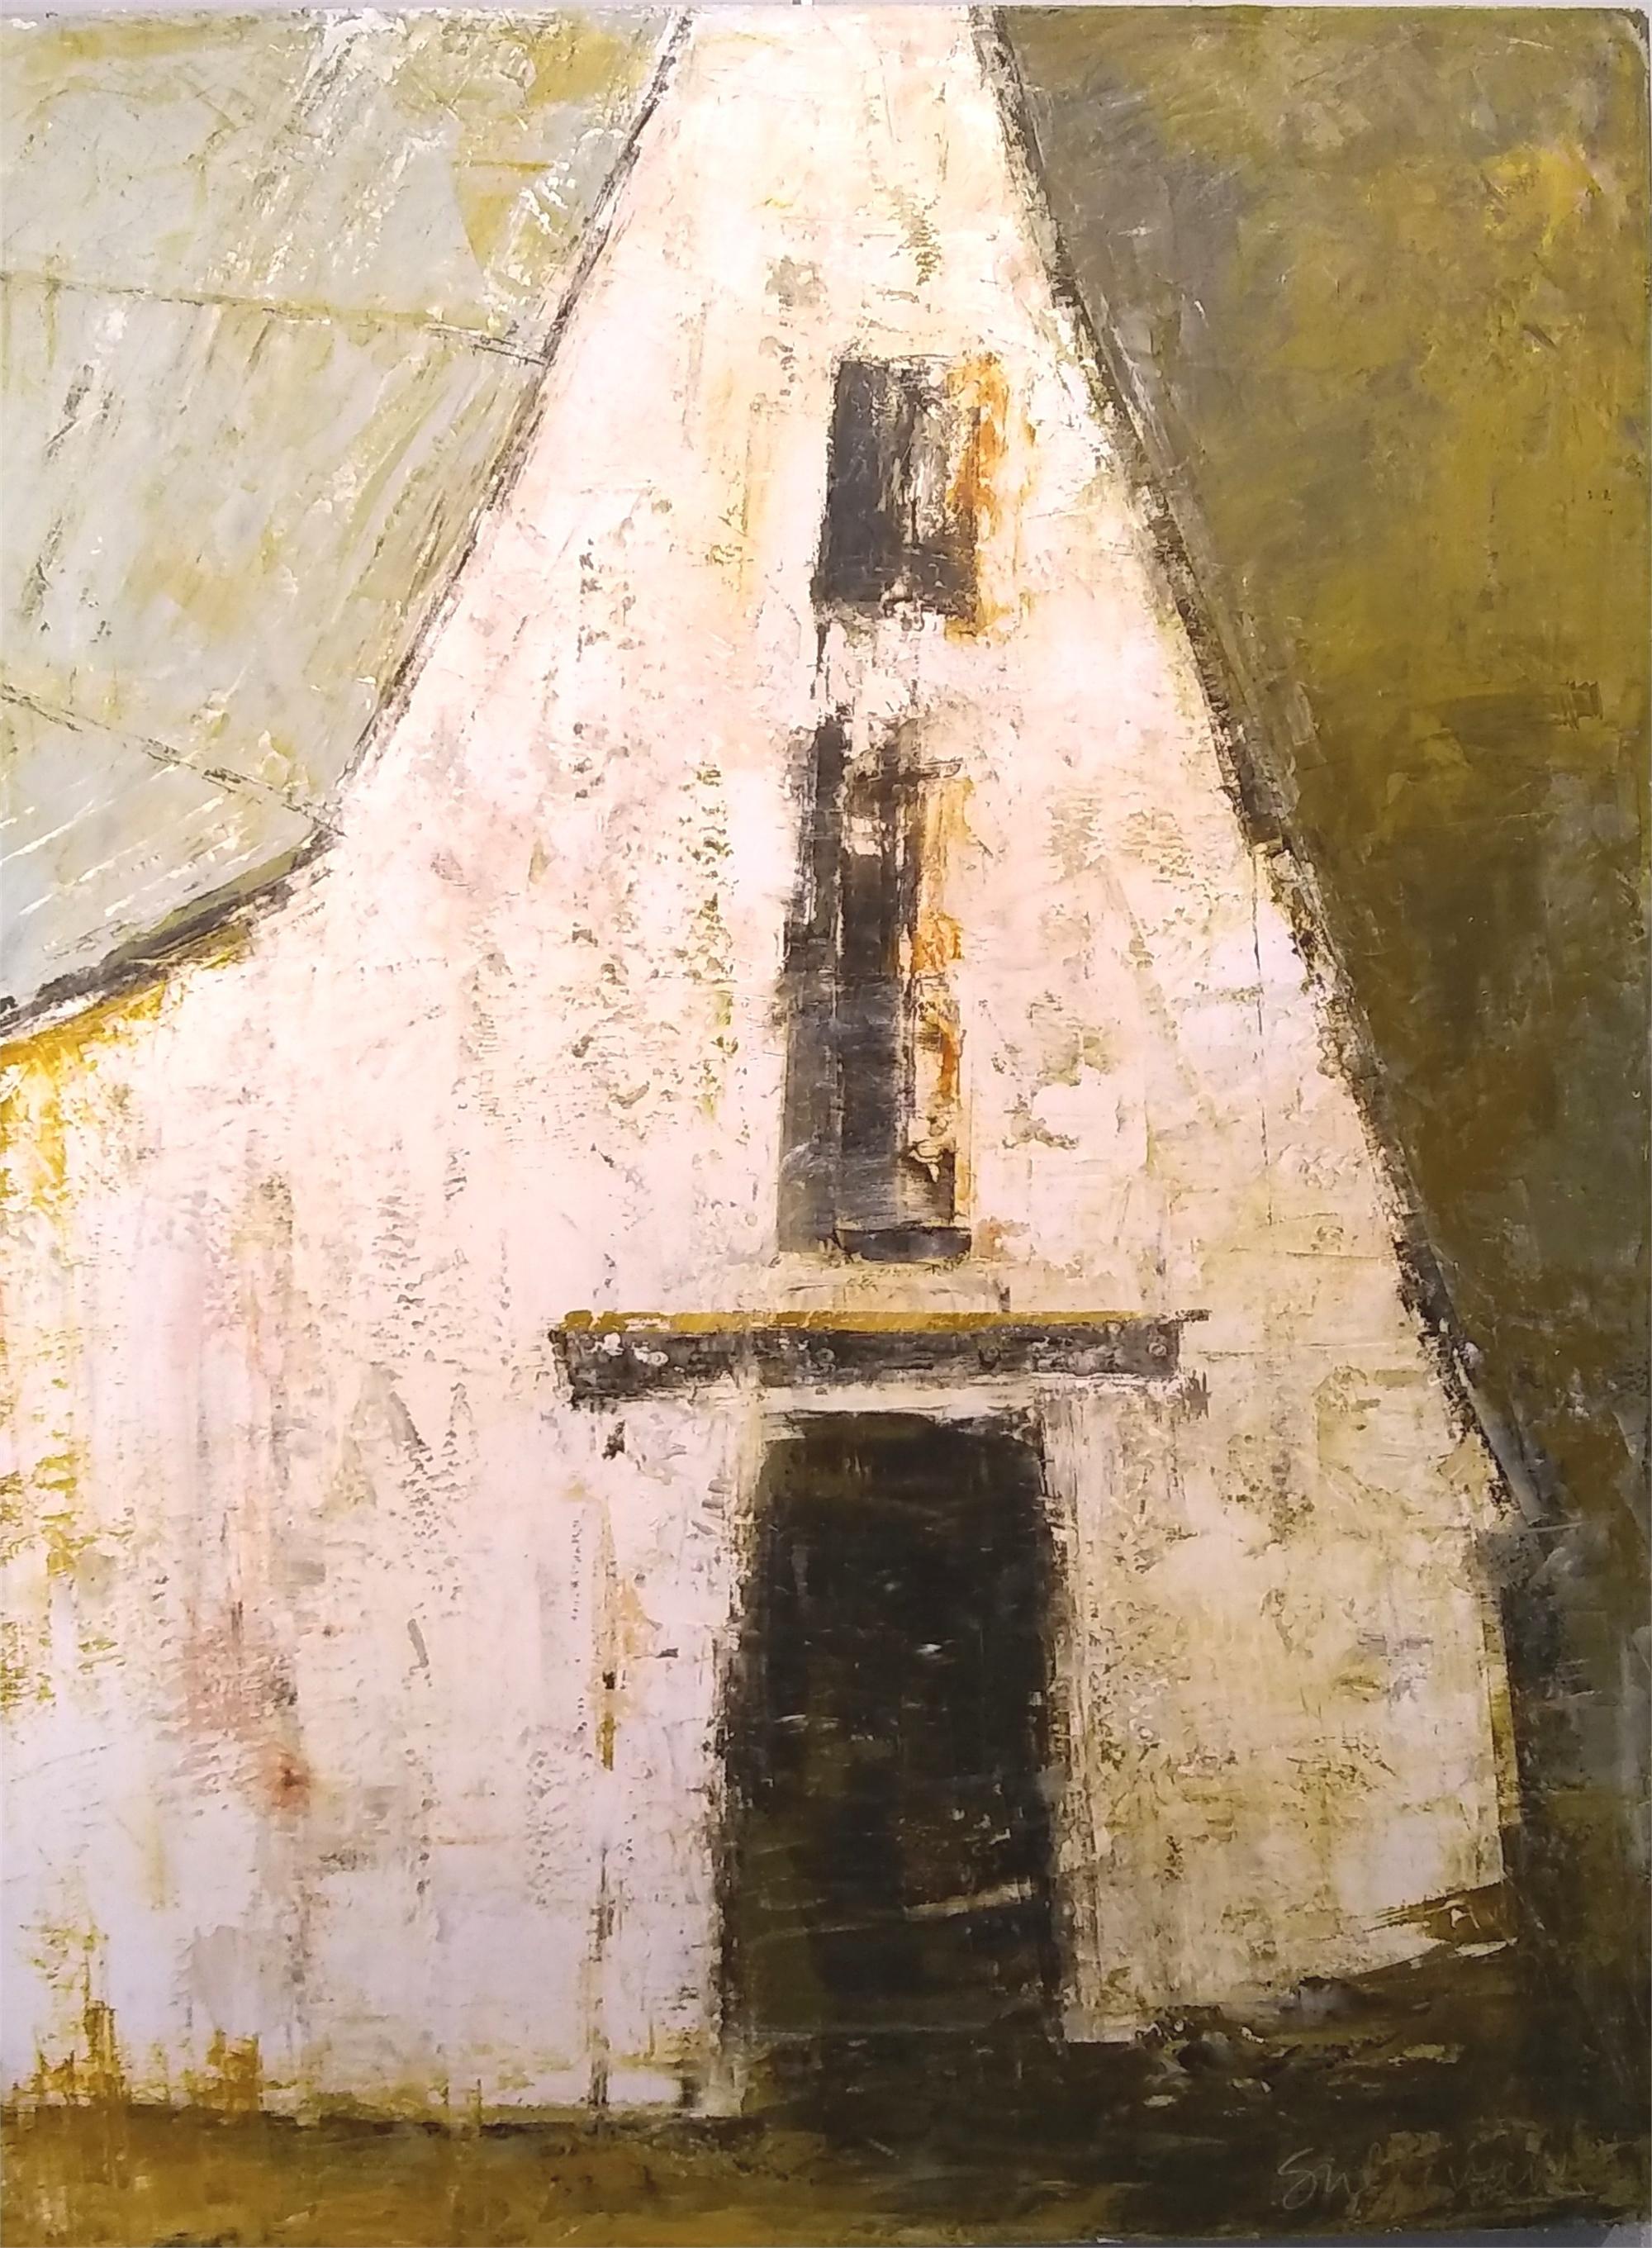 The Elegant Barn by Amy Sullivan